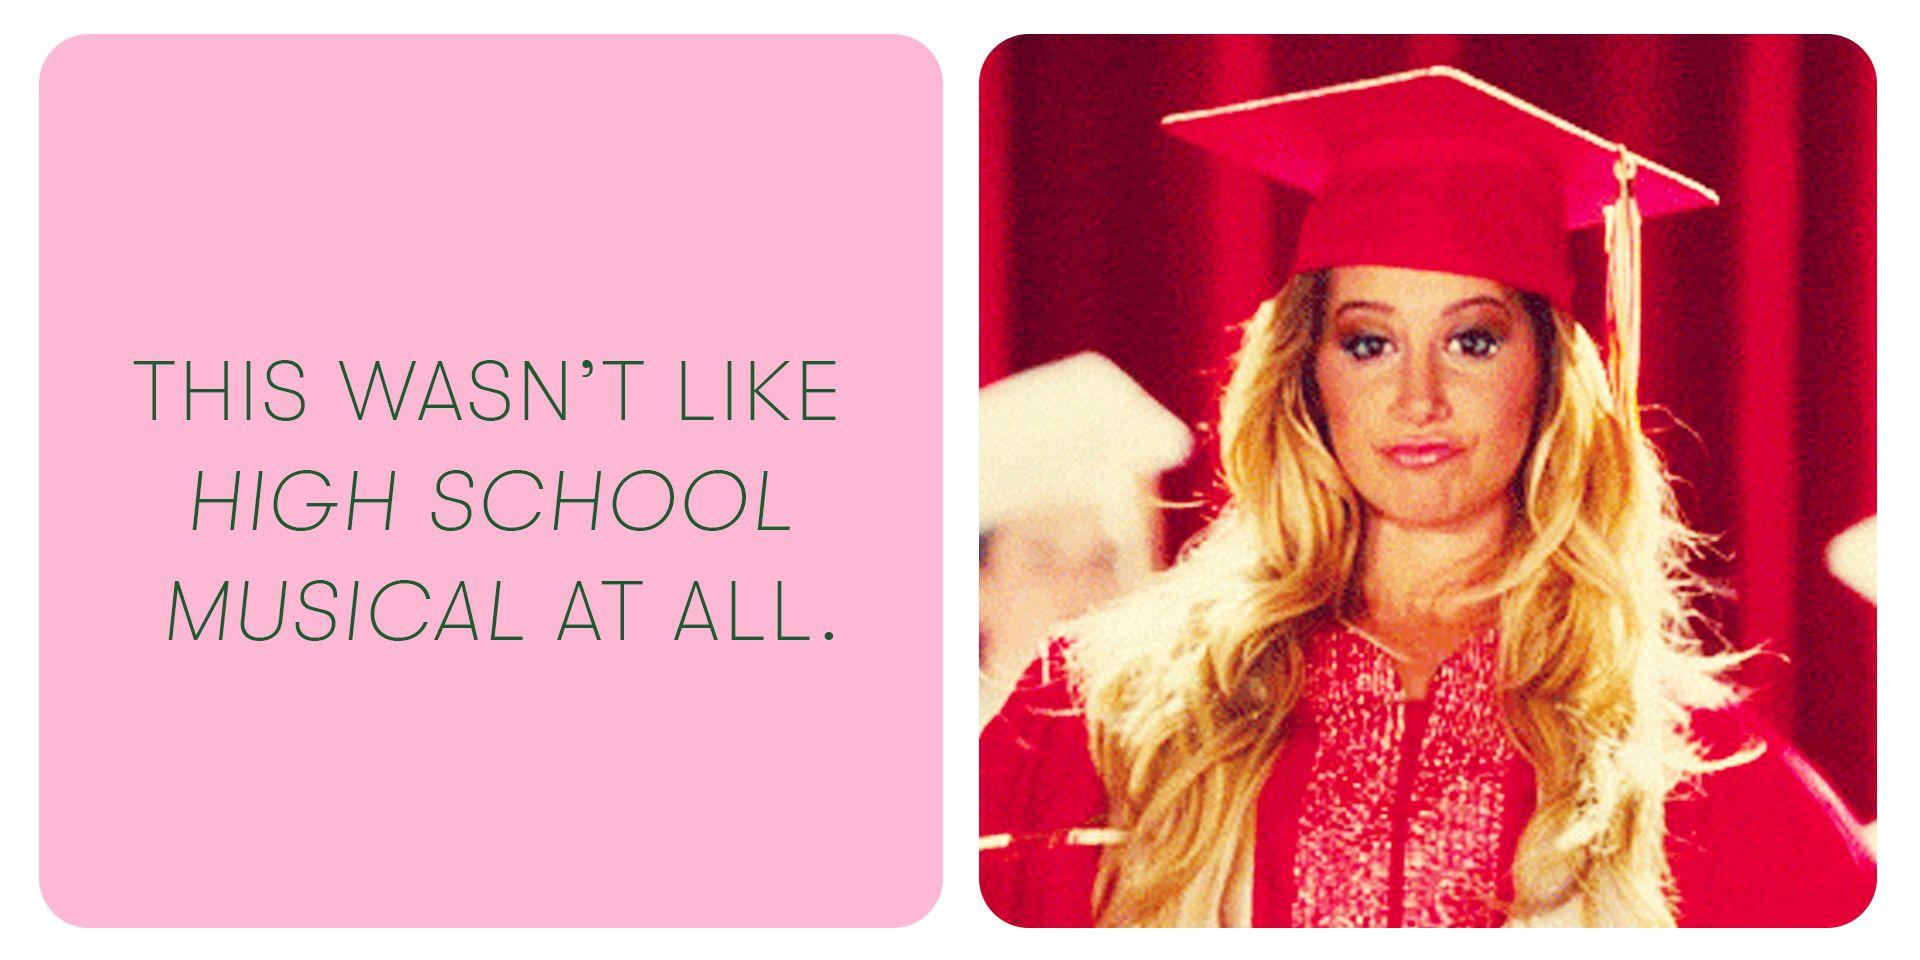 graduation instagram captions captions for graduation photos